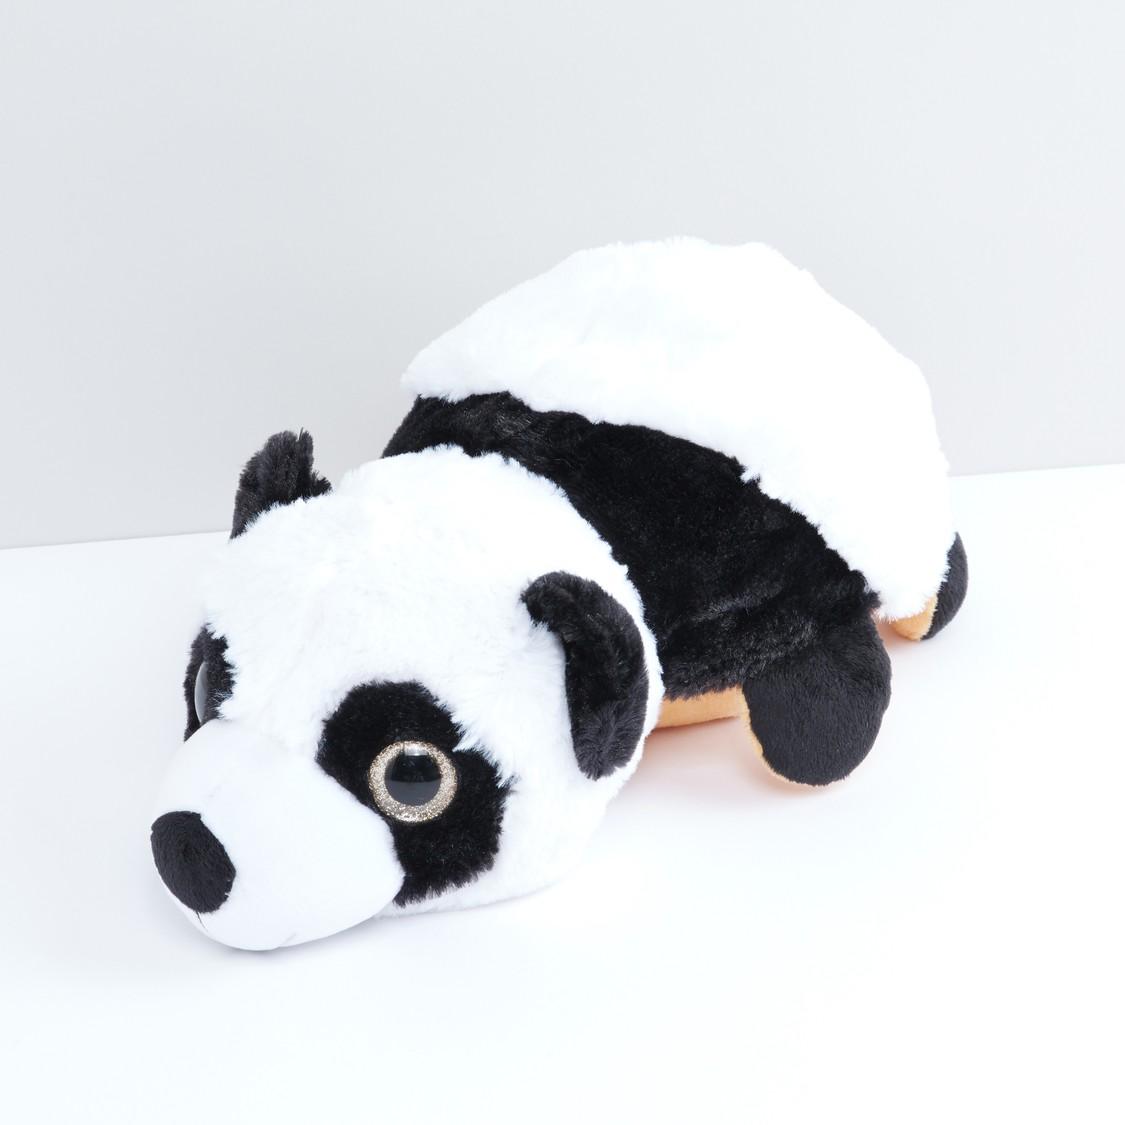 Plush Soft Toy - Set of 2